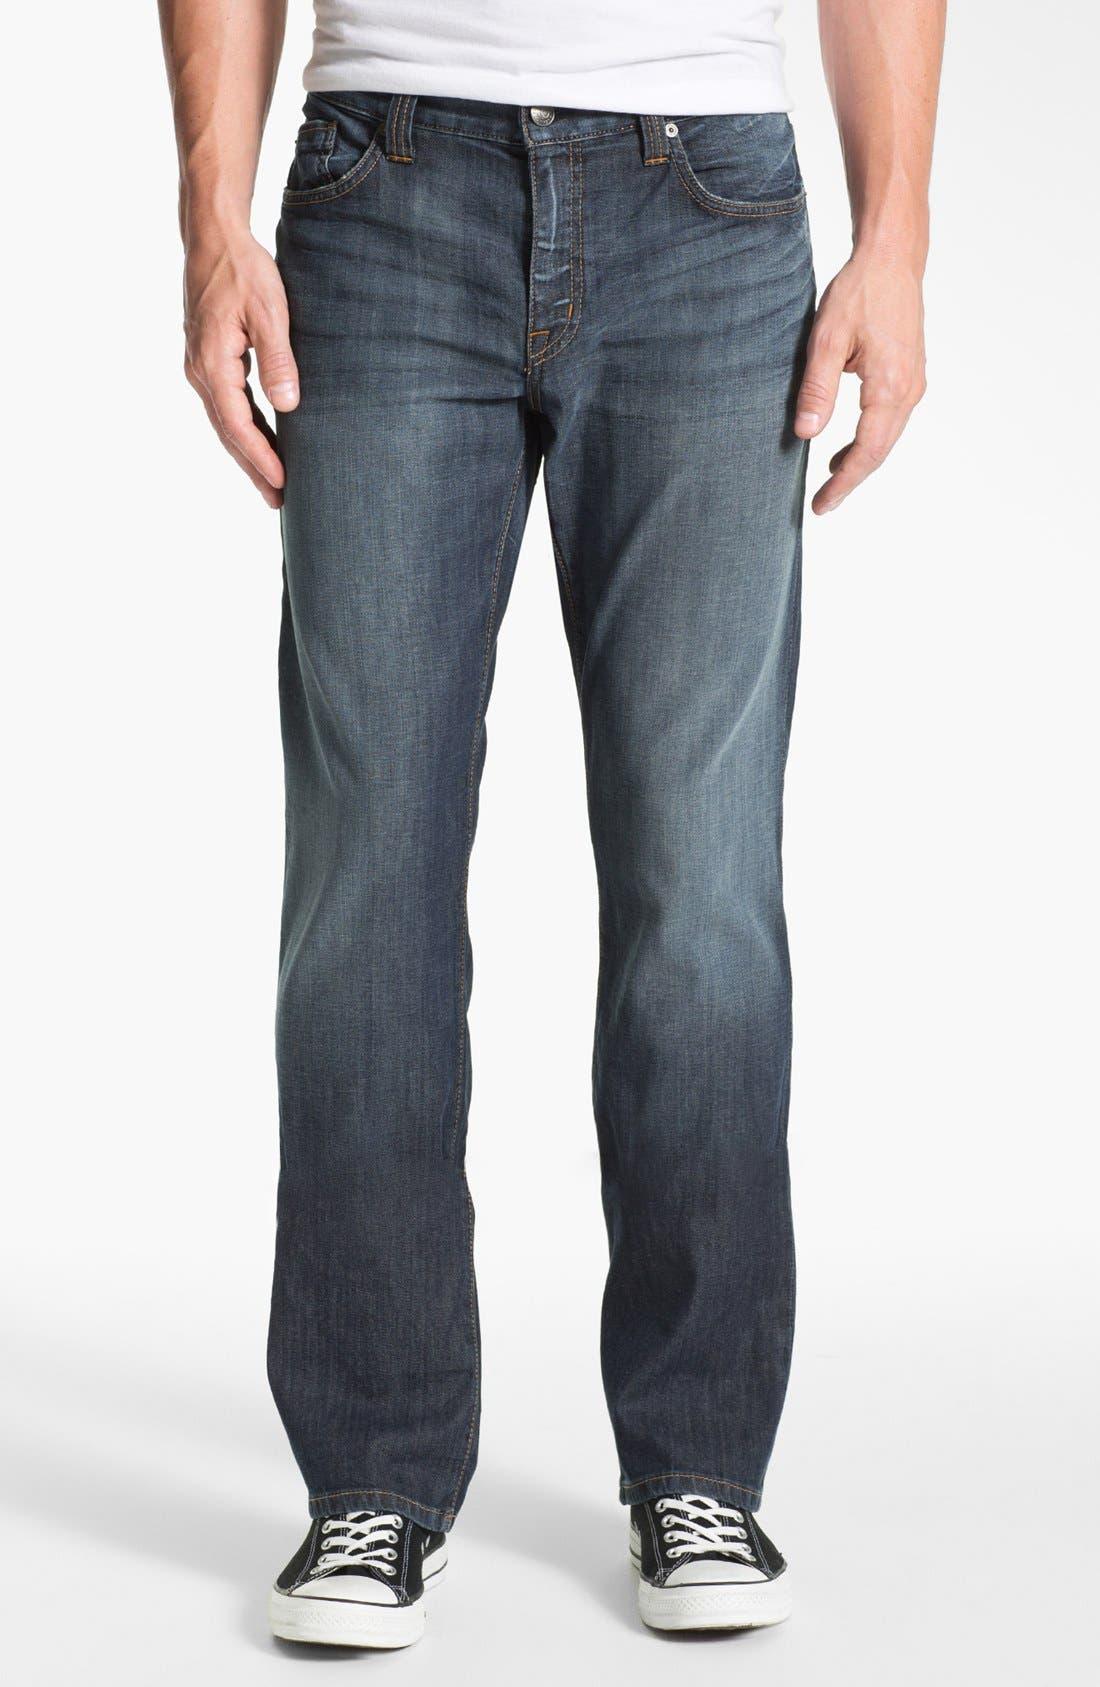 Alternate Image 1 Selected - Fidelity Denim '5011' Straight Leg Jeans (Iona Vintage)